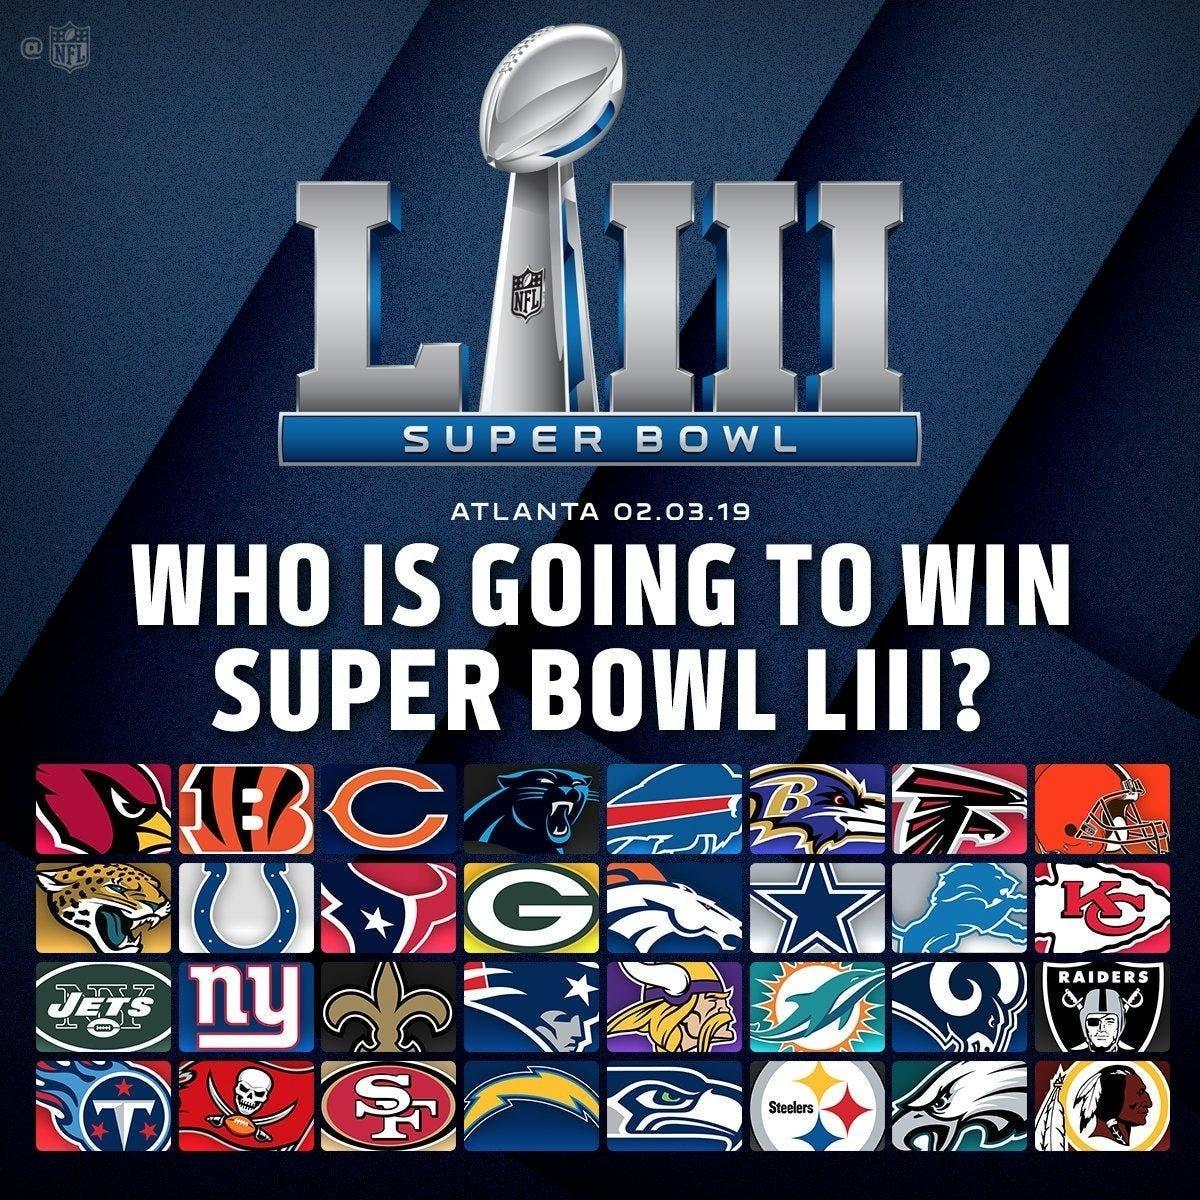 2019 Nfl Super Bowl Liii In Da Atl! At Doubletreehilton within 2019 Nfl Super Bowl